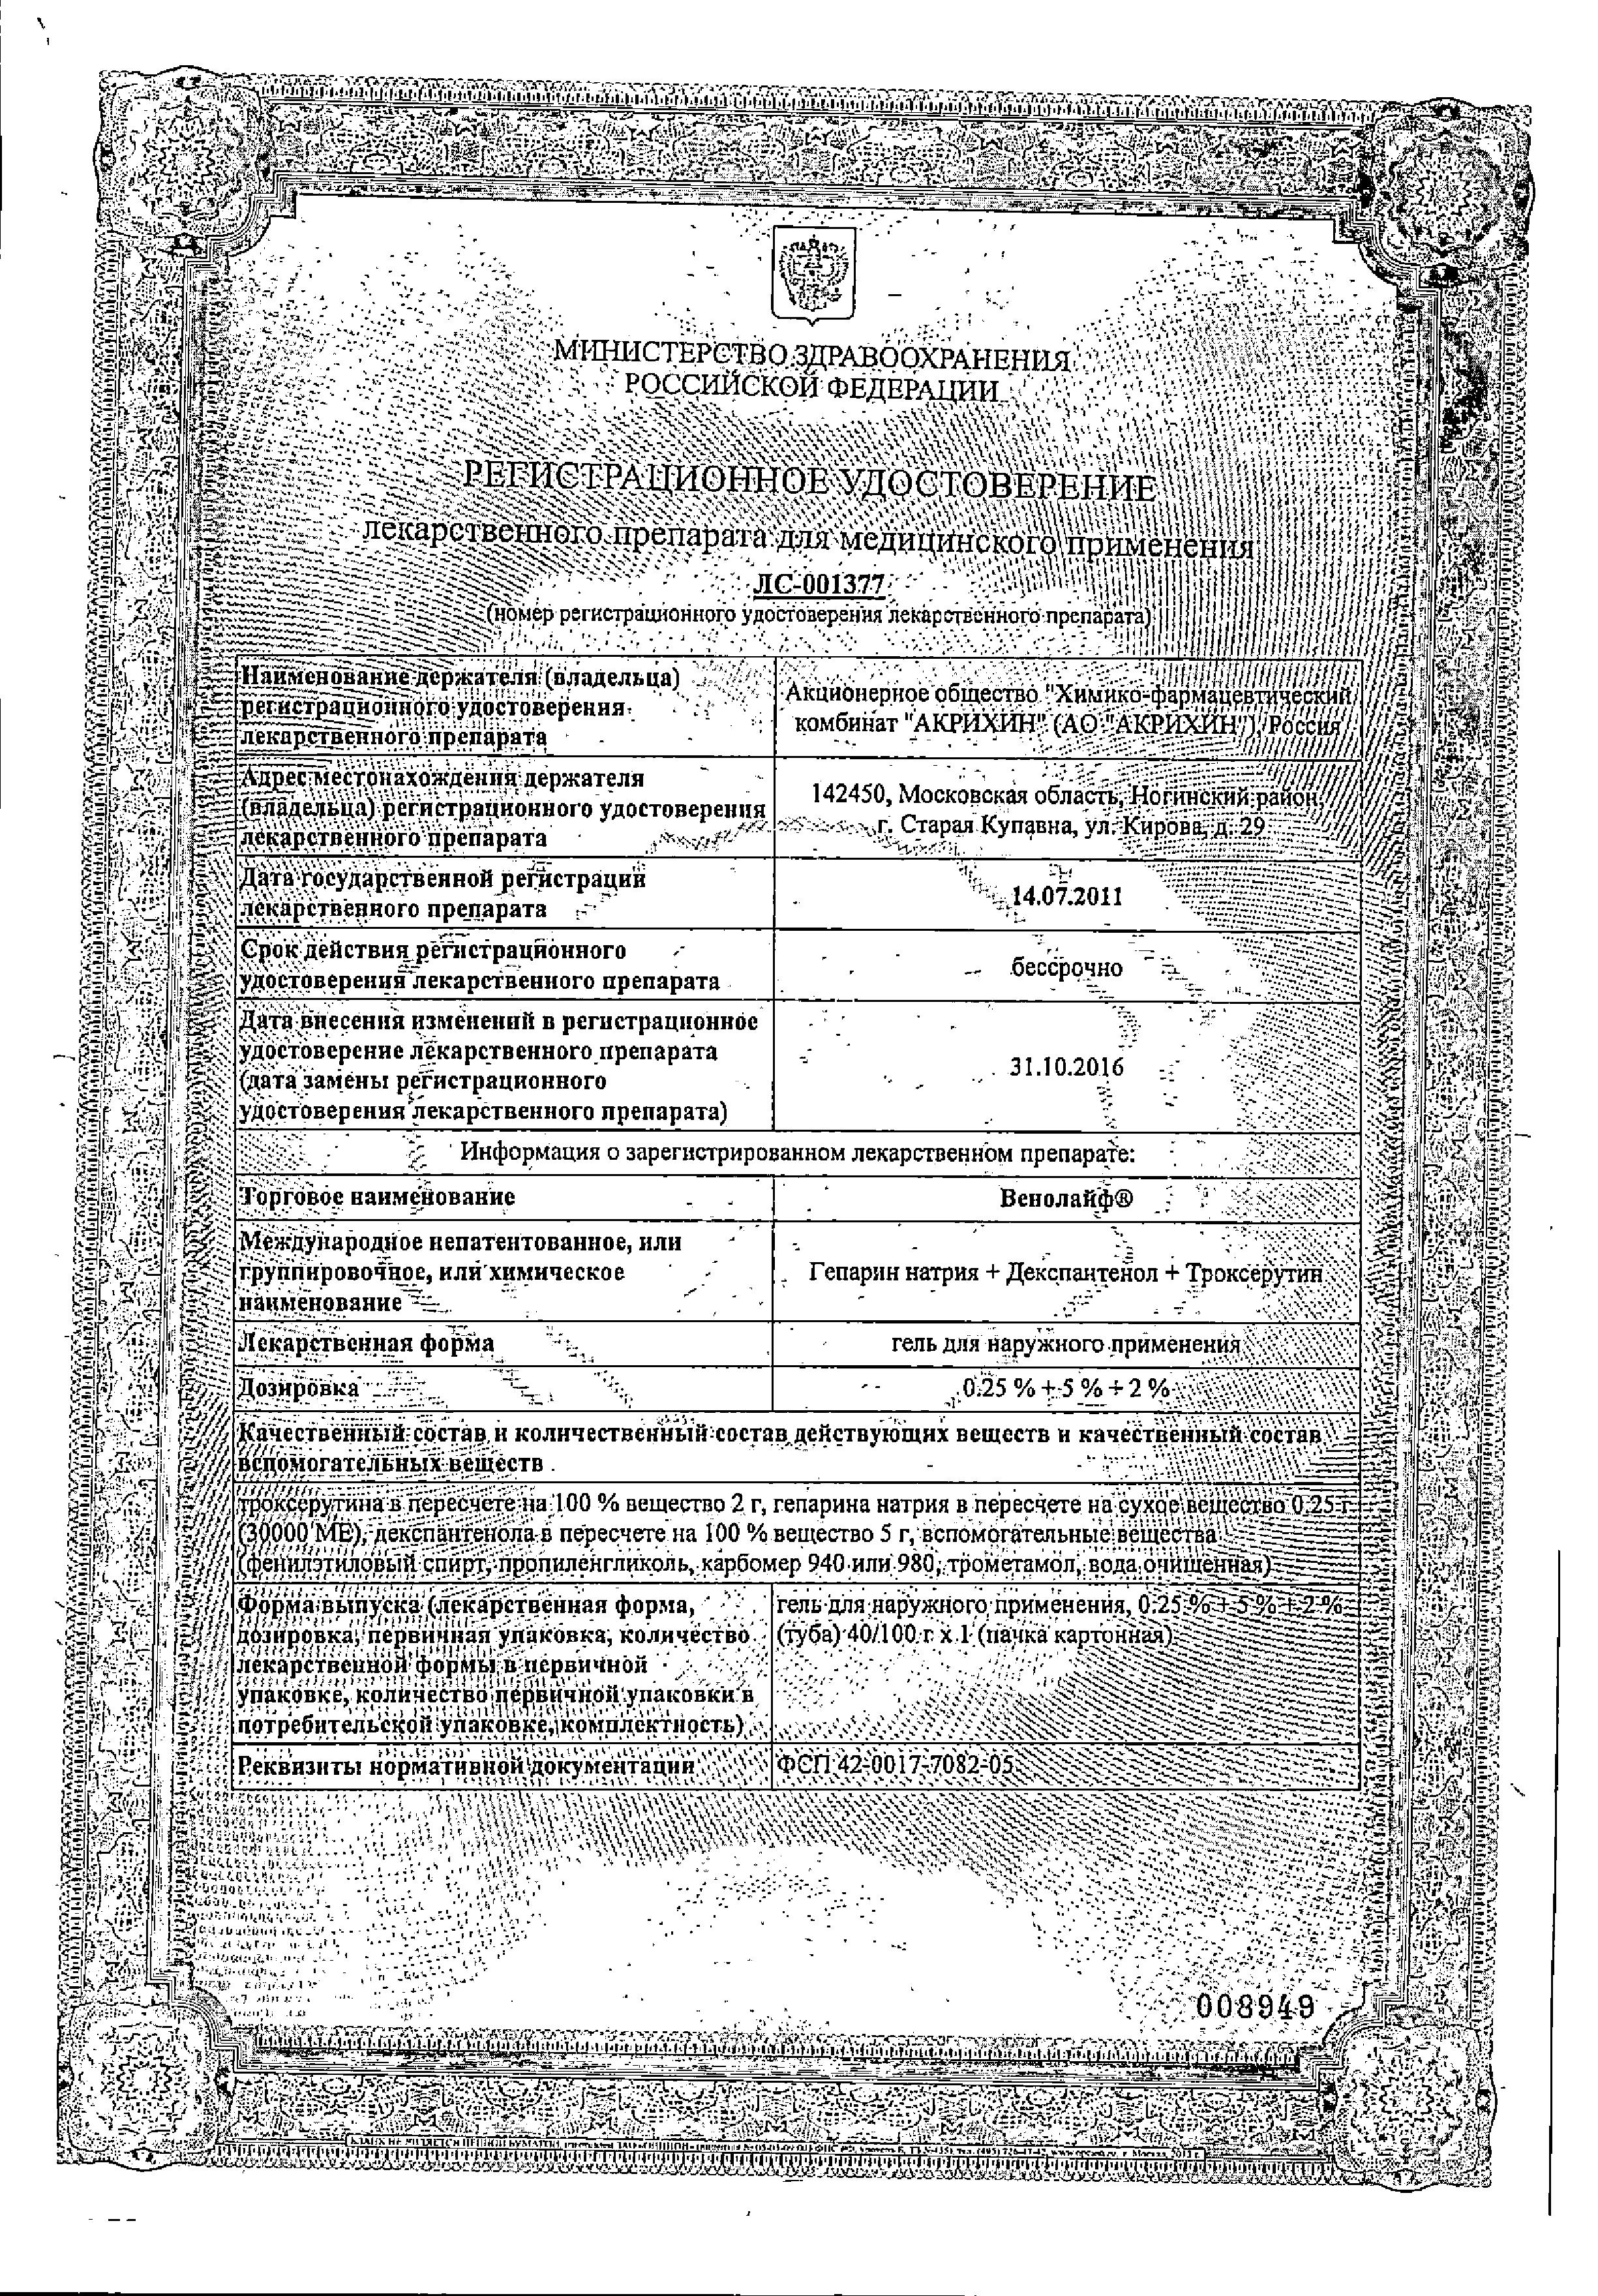 Венолайф сертификат